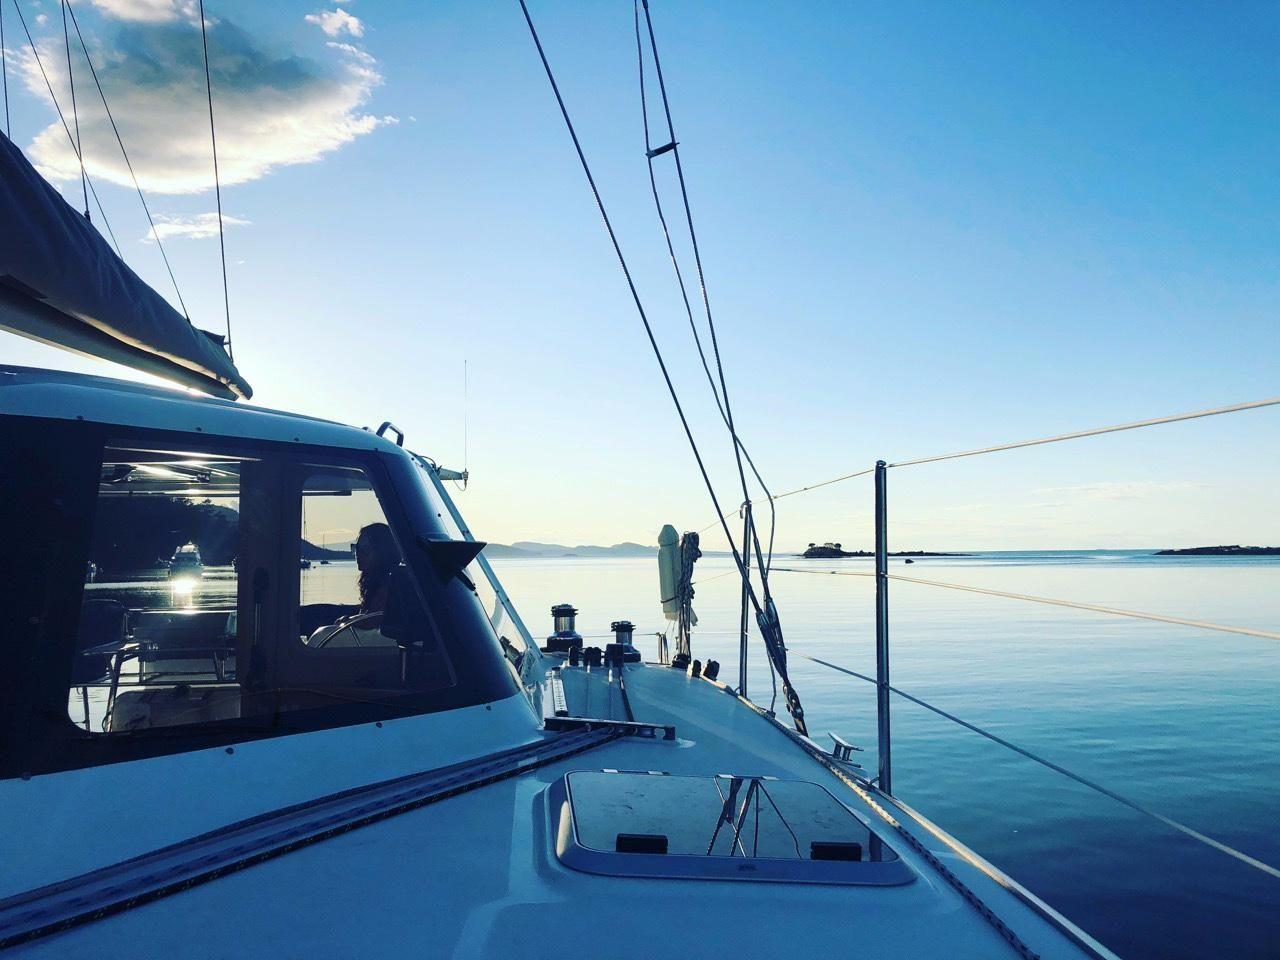 2020 New Seawind 1160 Catamaran Sailboat For Sale - $310,000